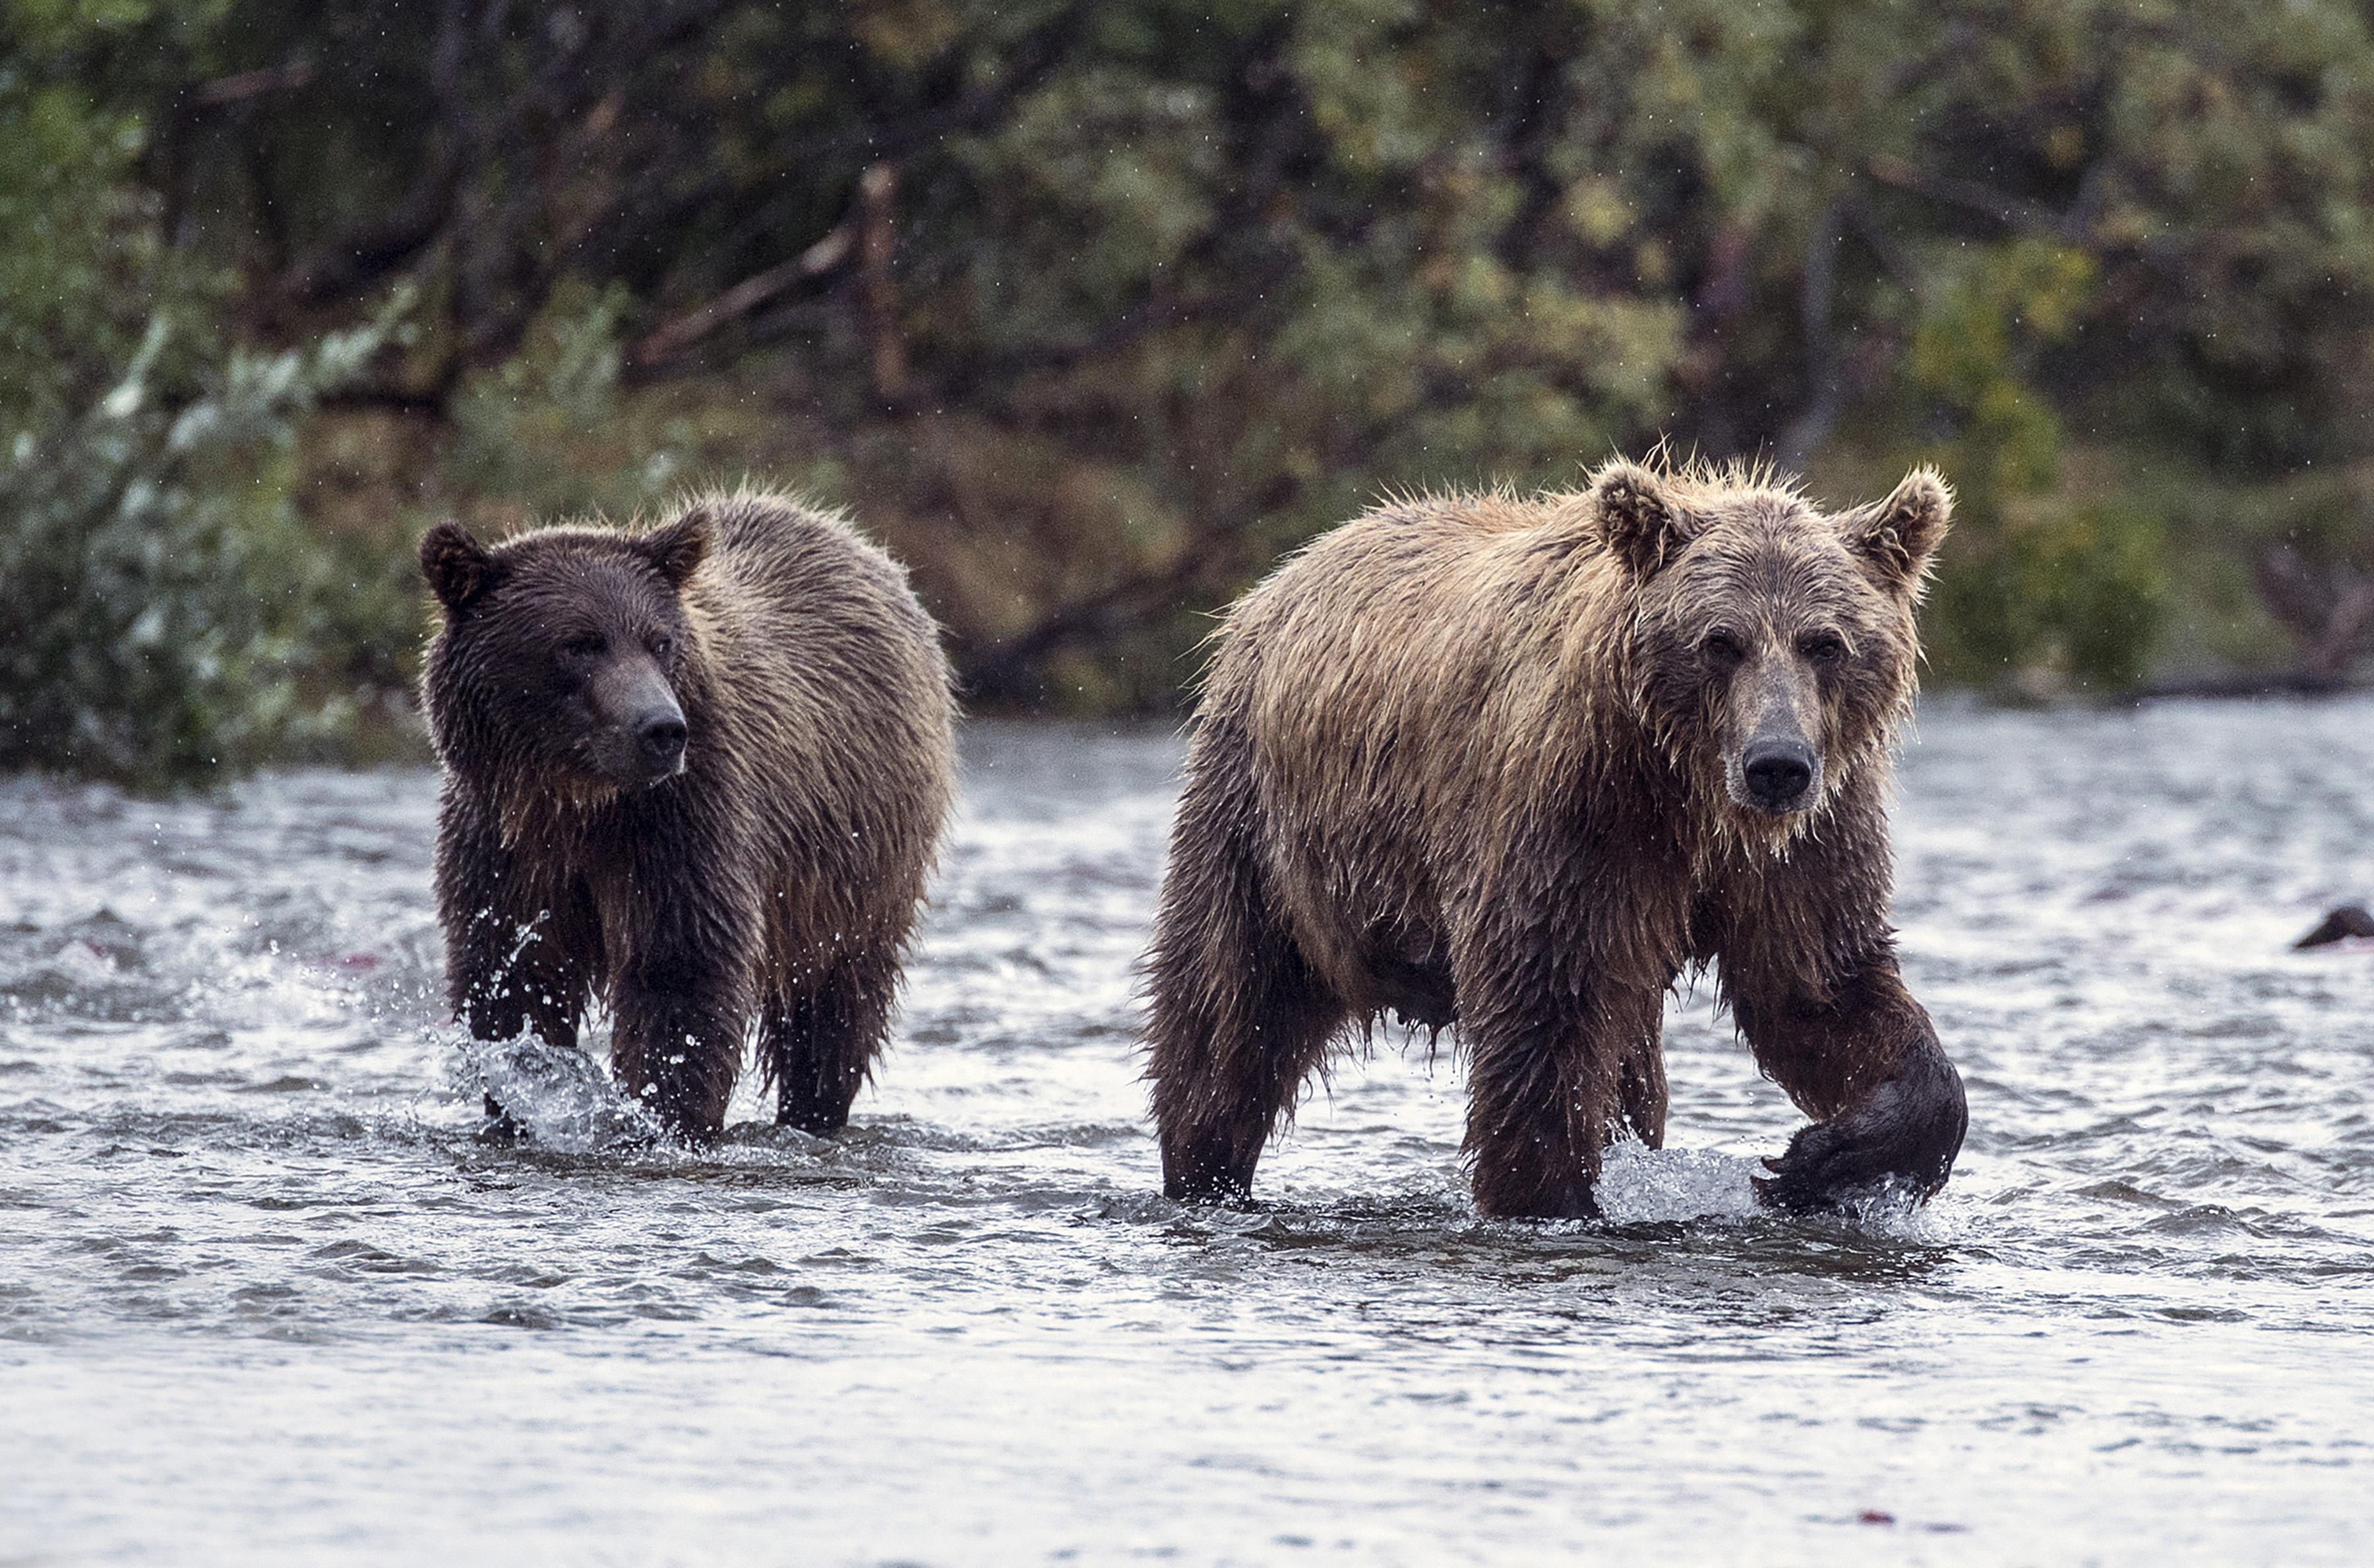 Brown bears in Katmai National Park, Alaska.